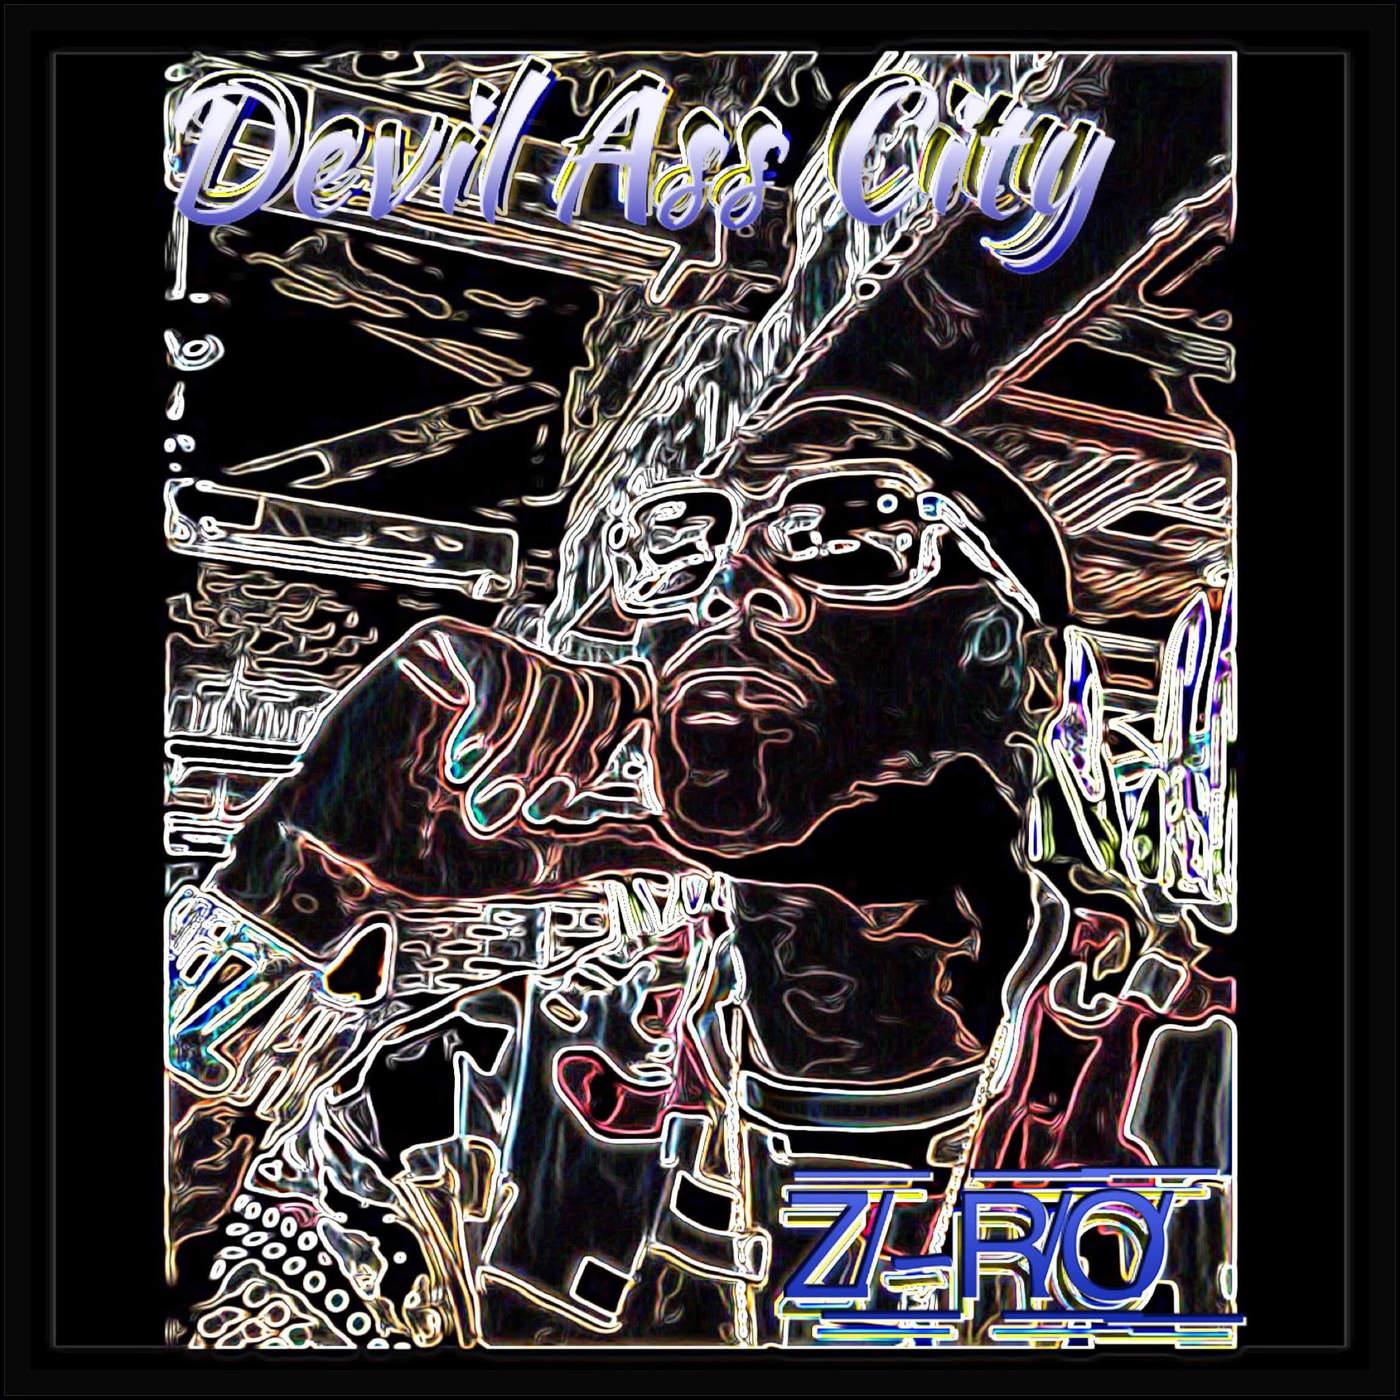 Z-Ro - Devil Ass City - Single Cover